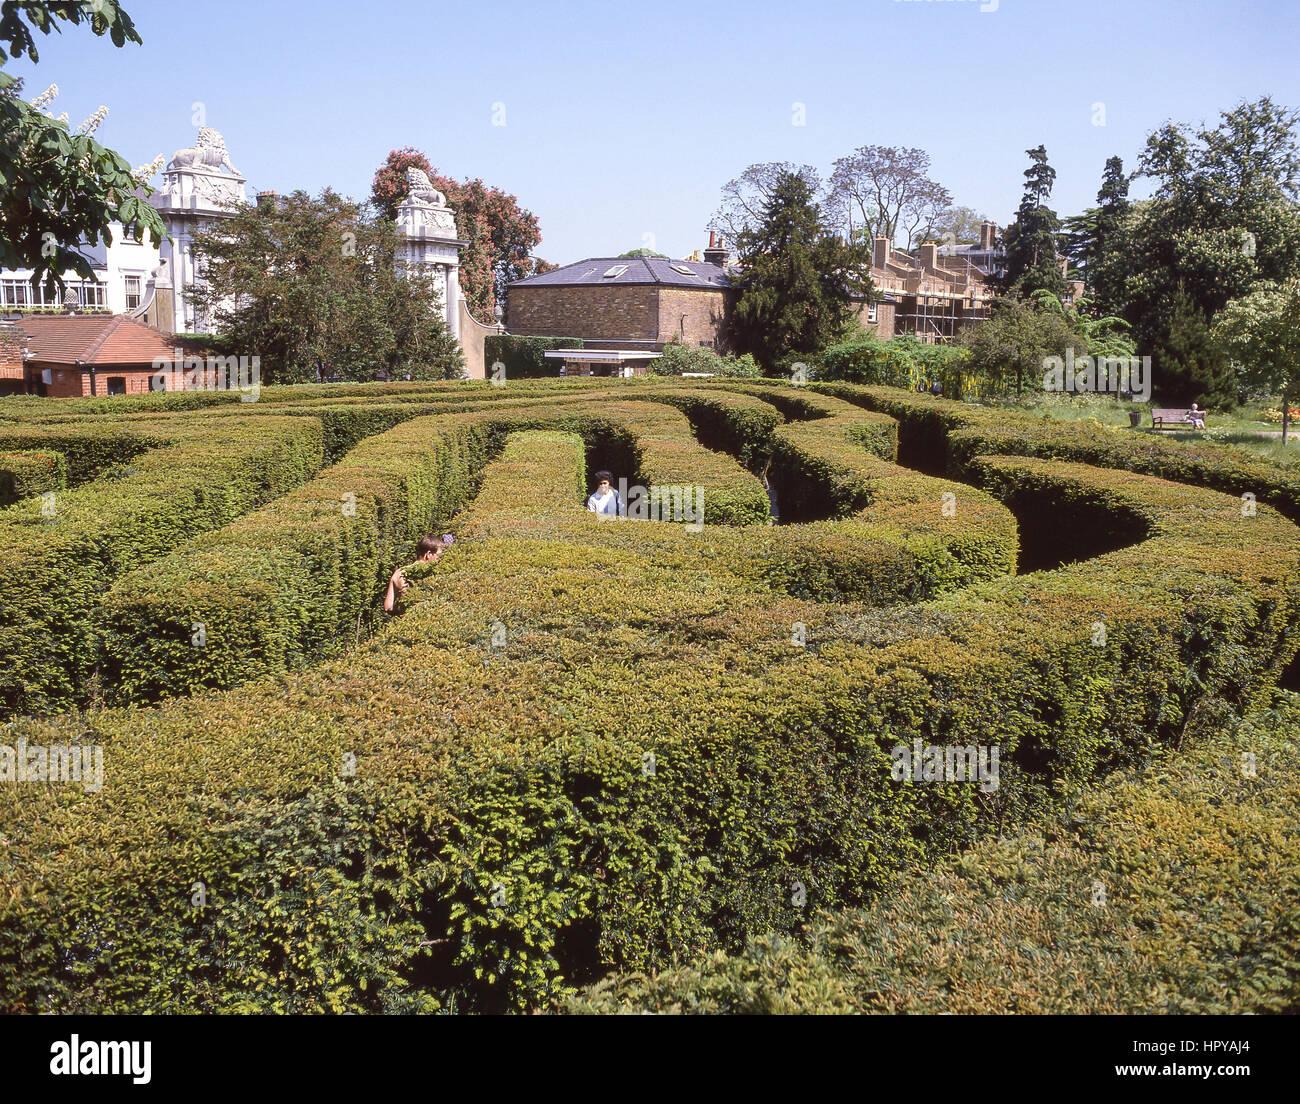 The Maze at Hampton Court Palace, Hampton, London Borough of Richmond upon Thames, Greater London, England, United - Stock Image